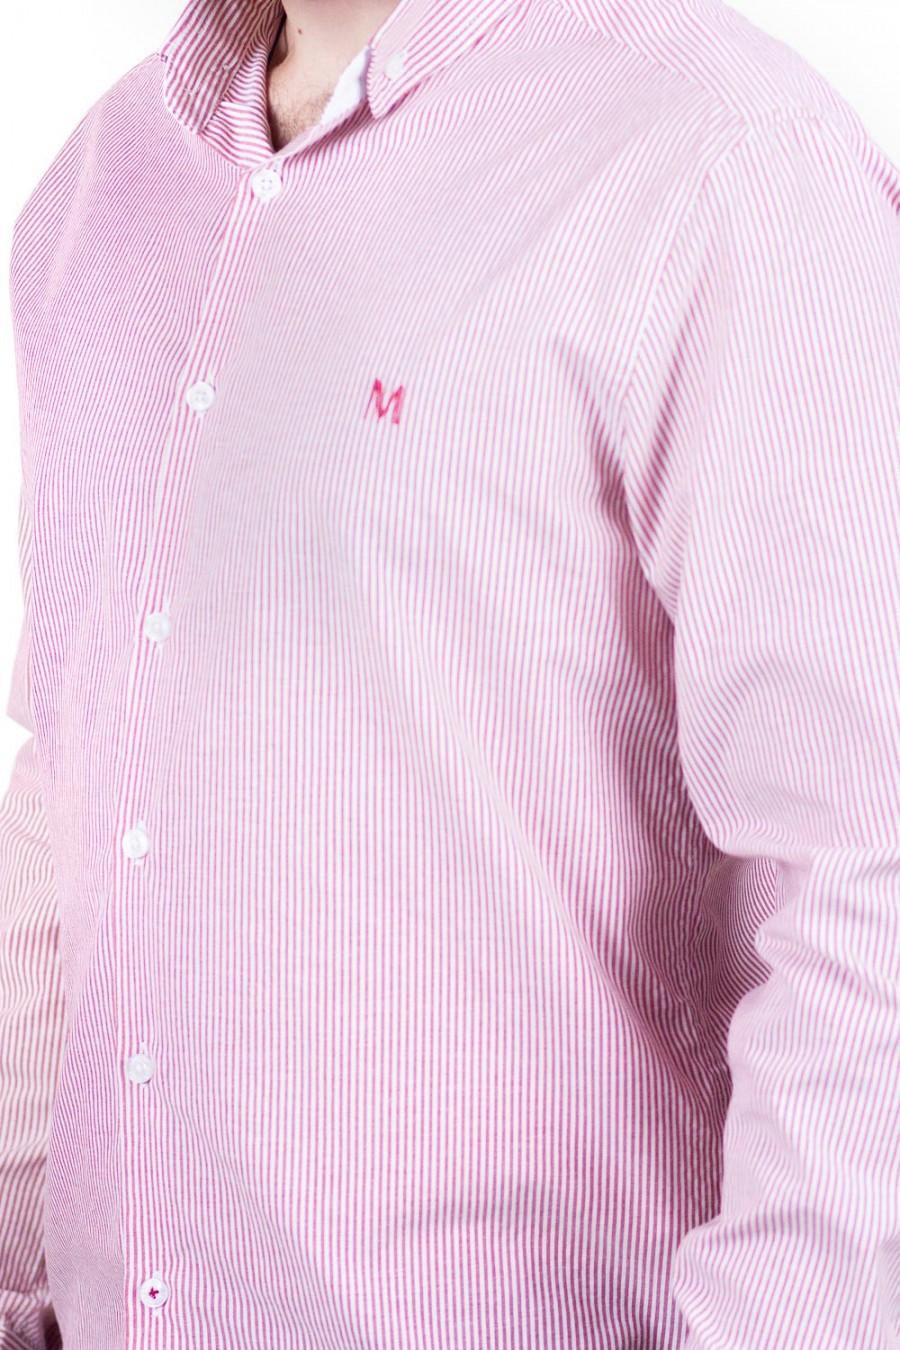 Мужская рубашка S-119-11